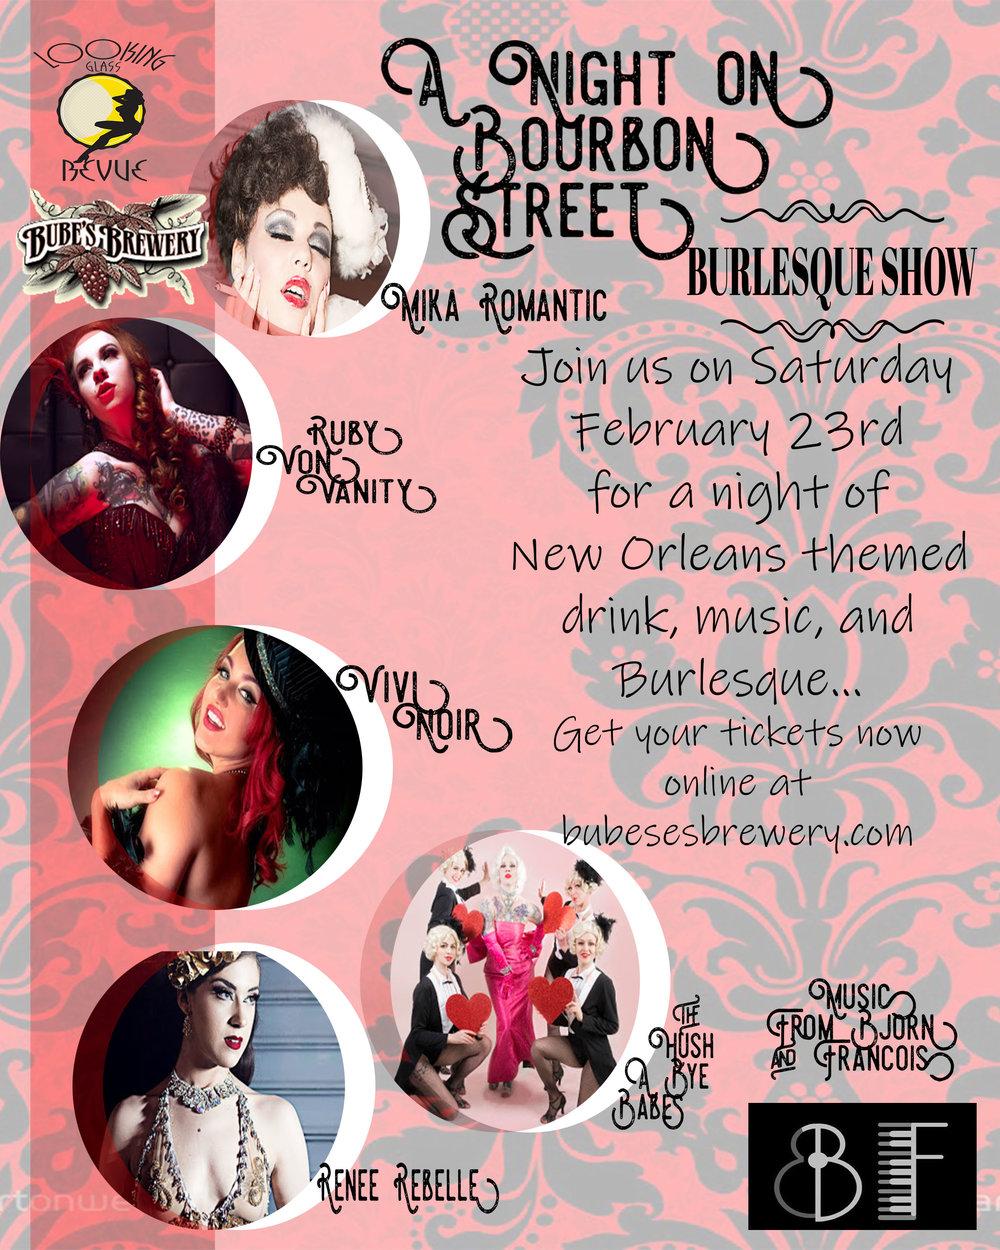 burlesque talent temp2.jpg